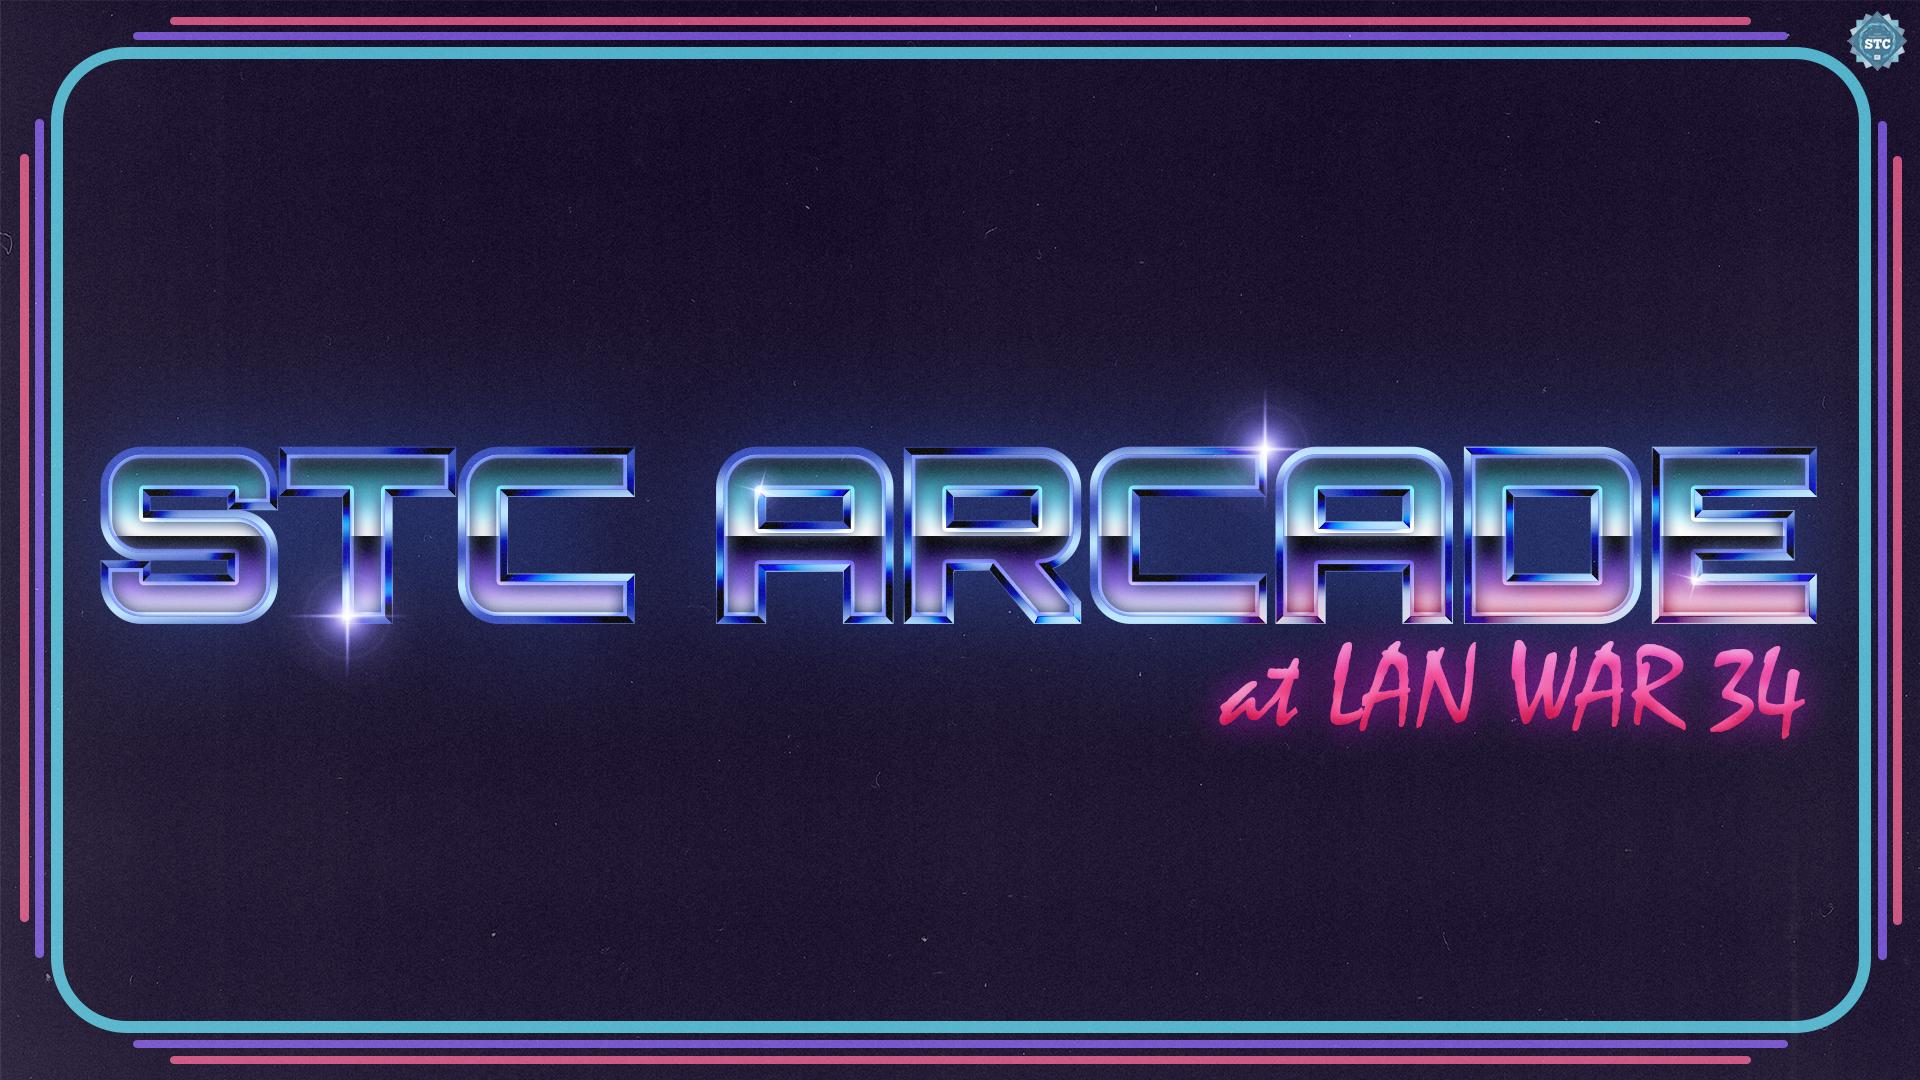 3 stc arcade wallpaper